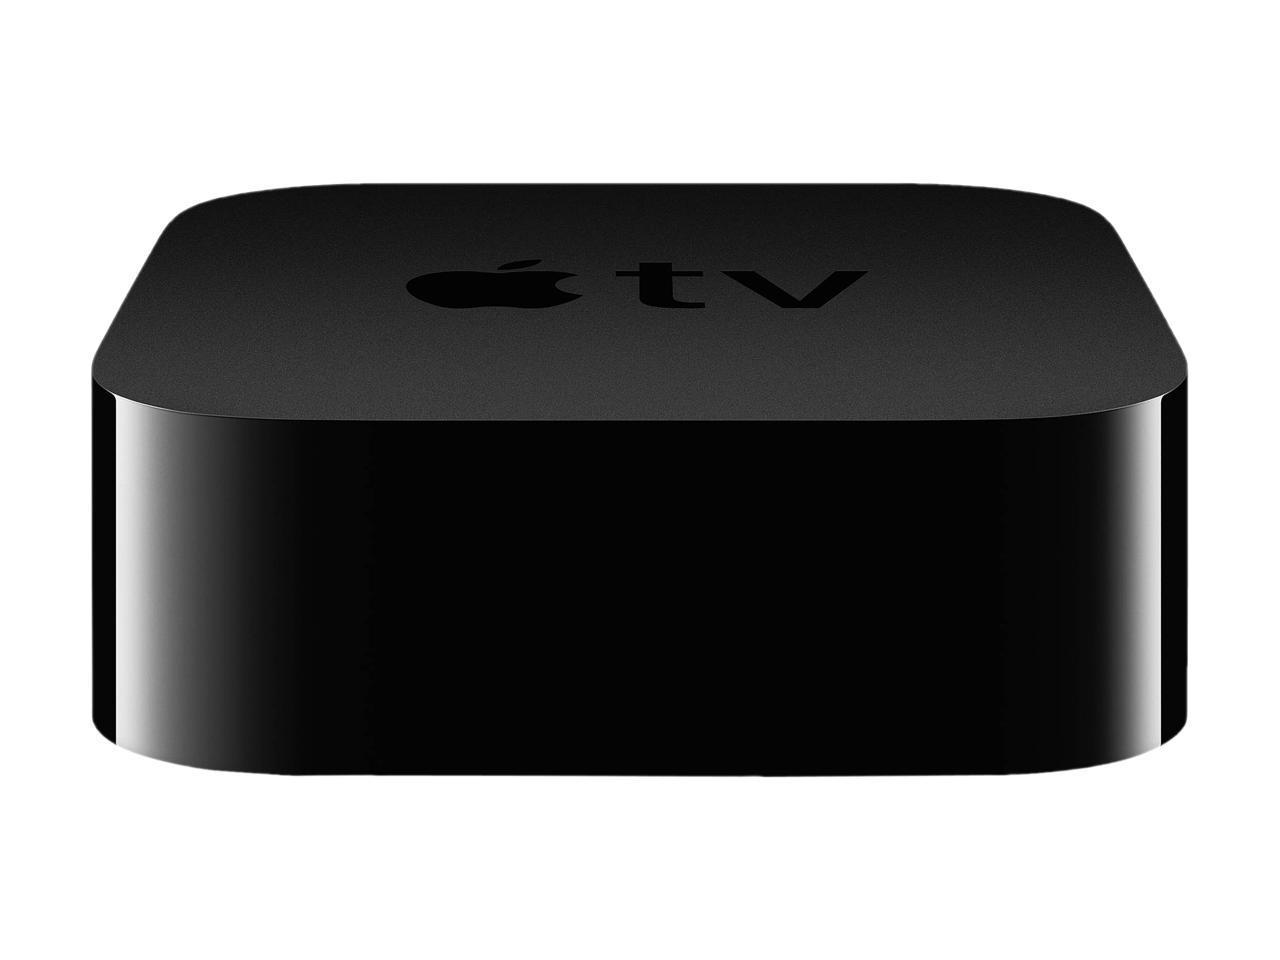 Apple TV 4K HDR (32GB, Latest Model) MQD22LL/A Open Box